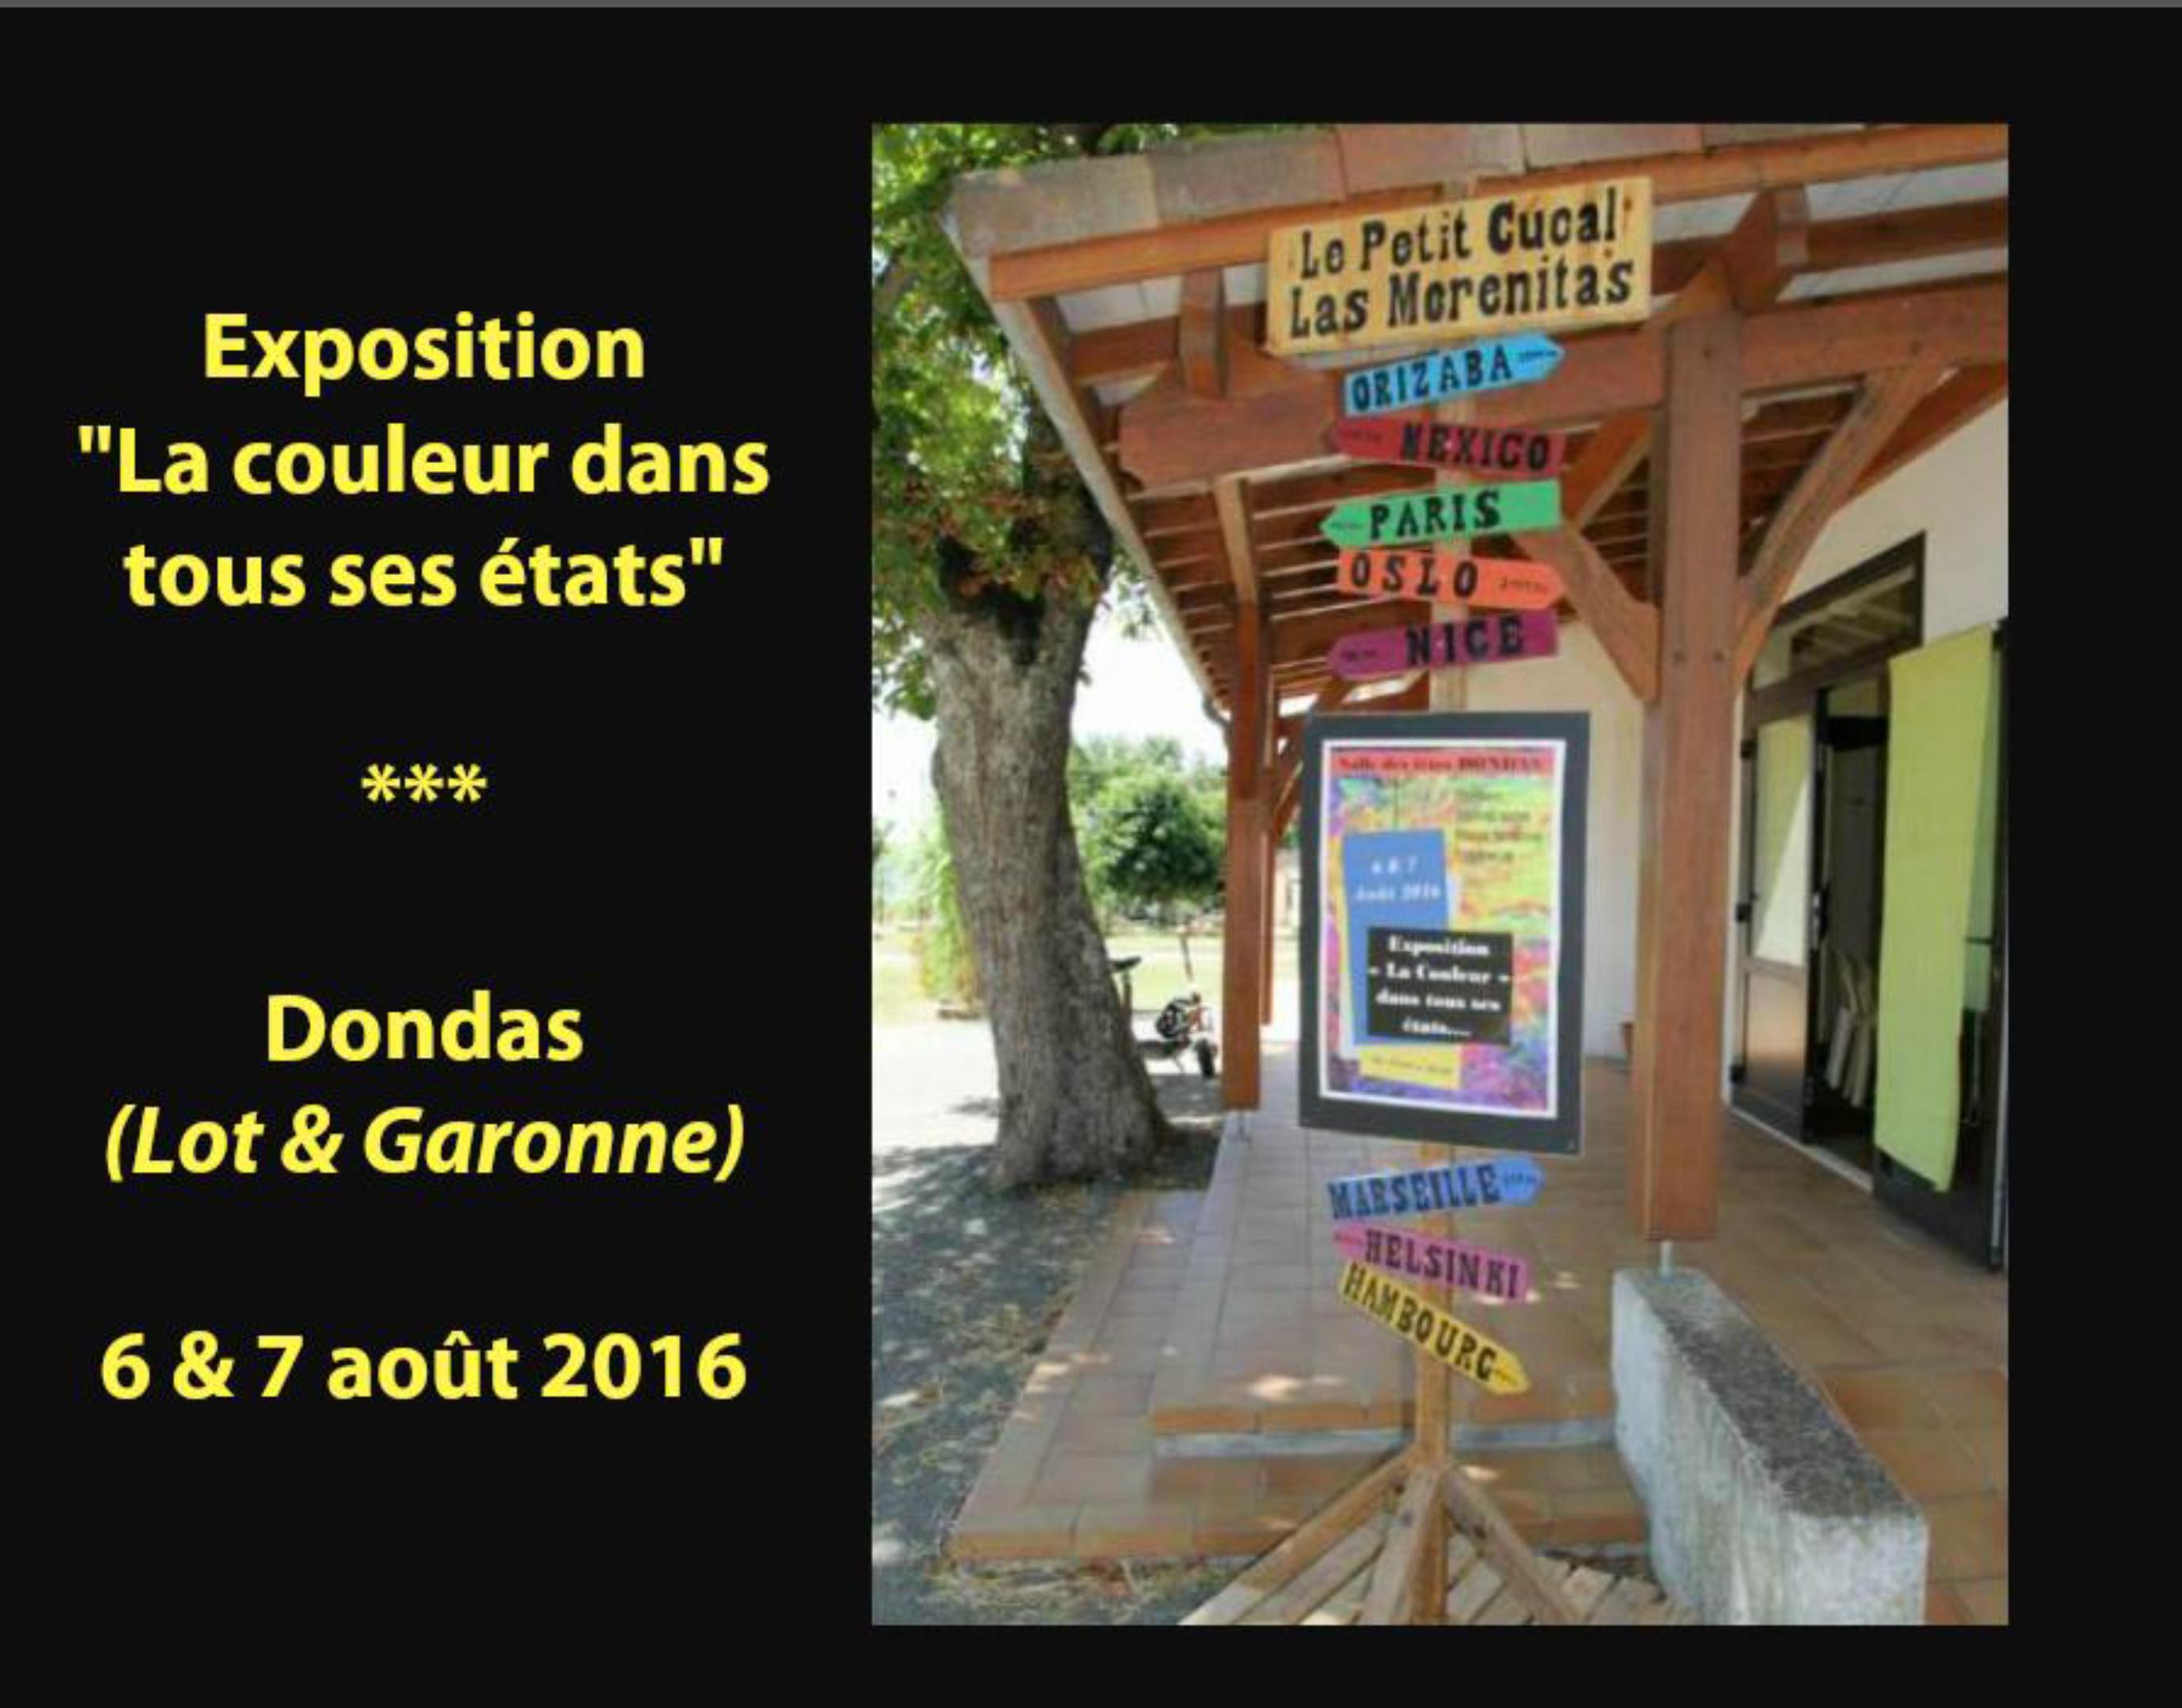 expo Dondas-page couverture